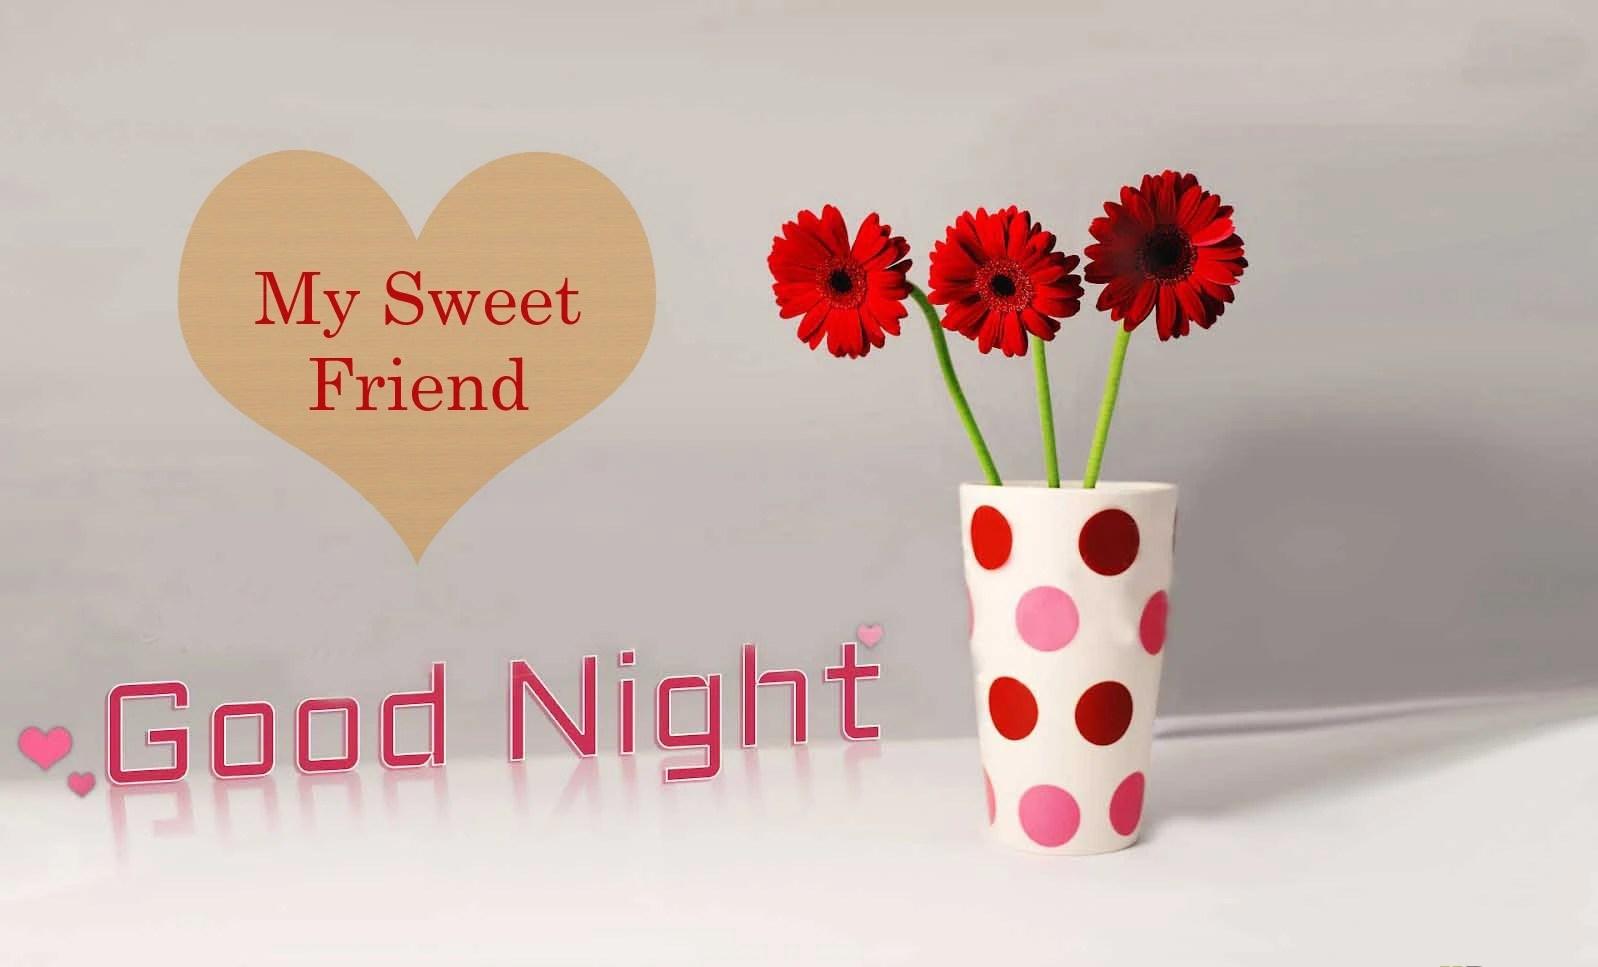 Good night flowers heart image